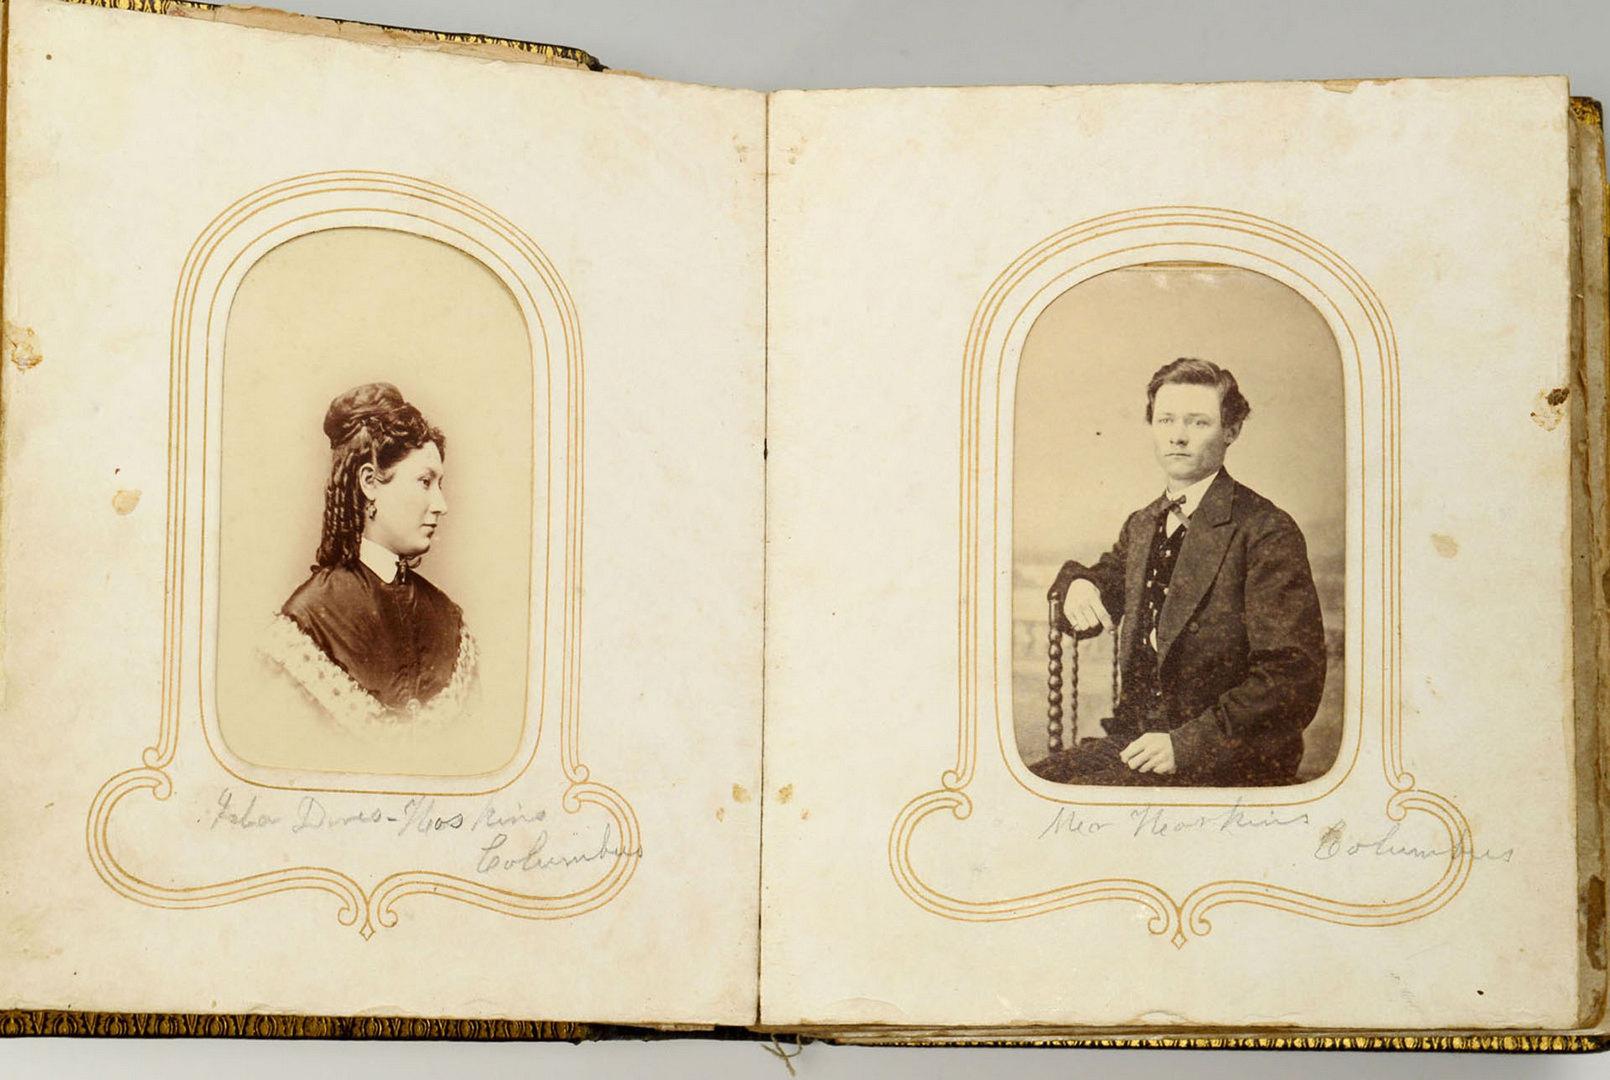 Lot 318: Civil War Era CDV photo album, Wemyss family